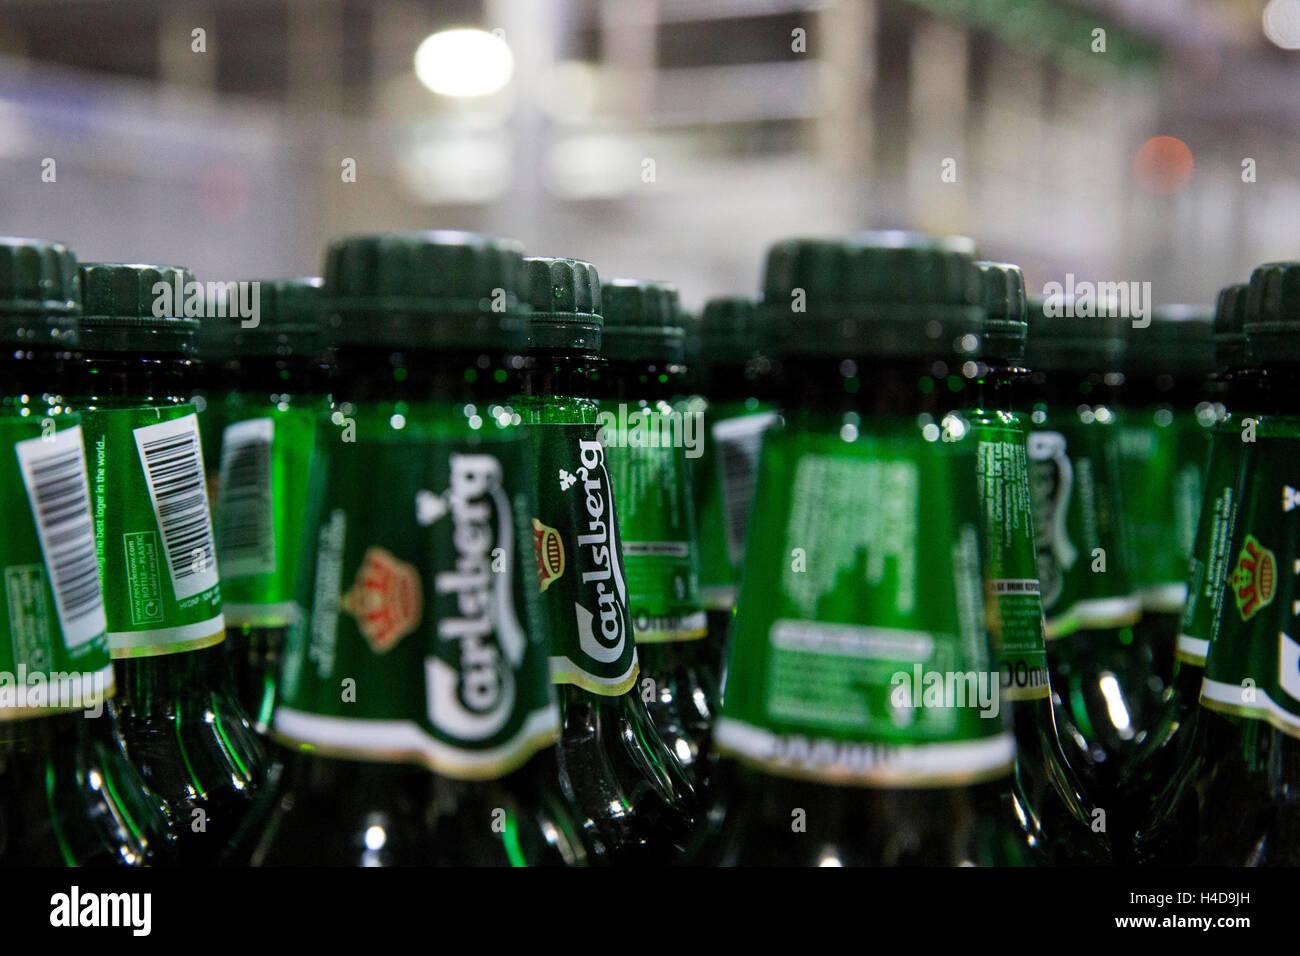 Carlsberg Deutschland GmbH report: Filling flasks PET mountain Carls - Stock Image